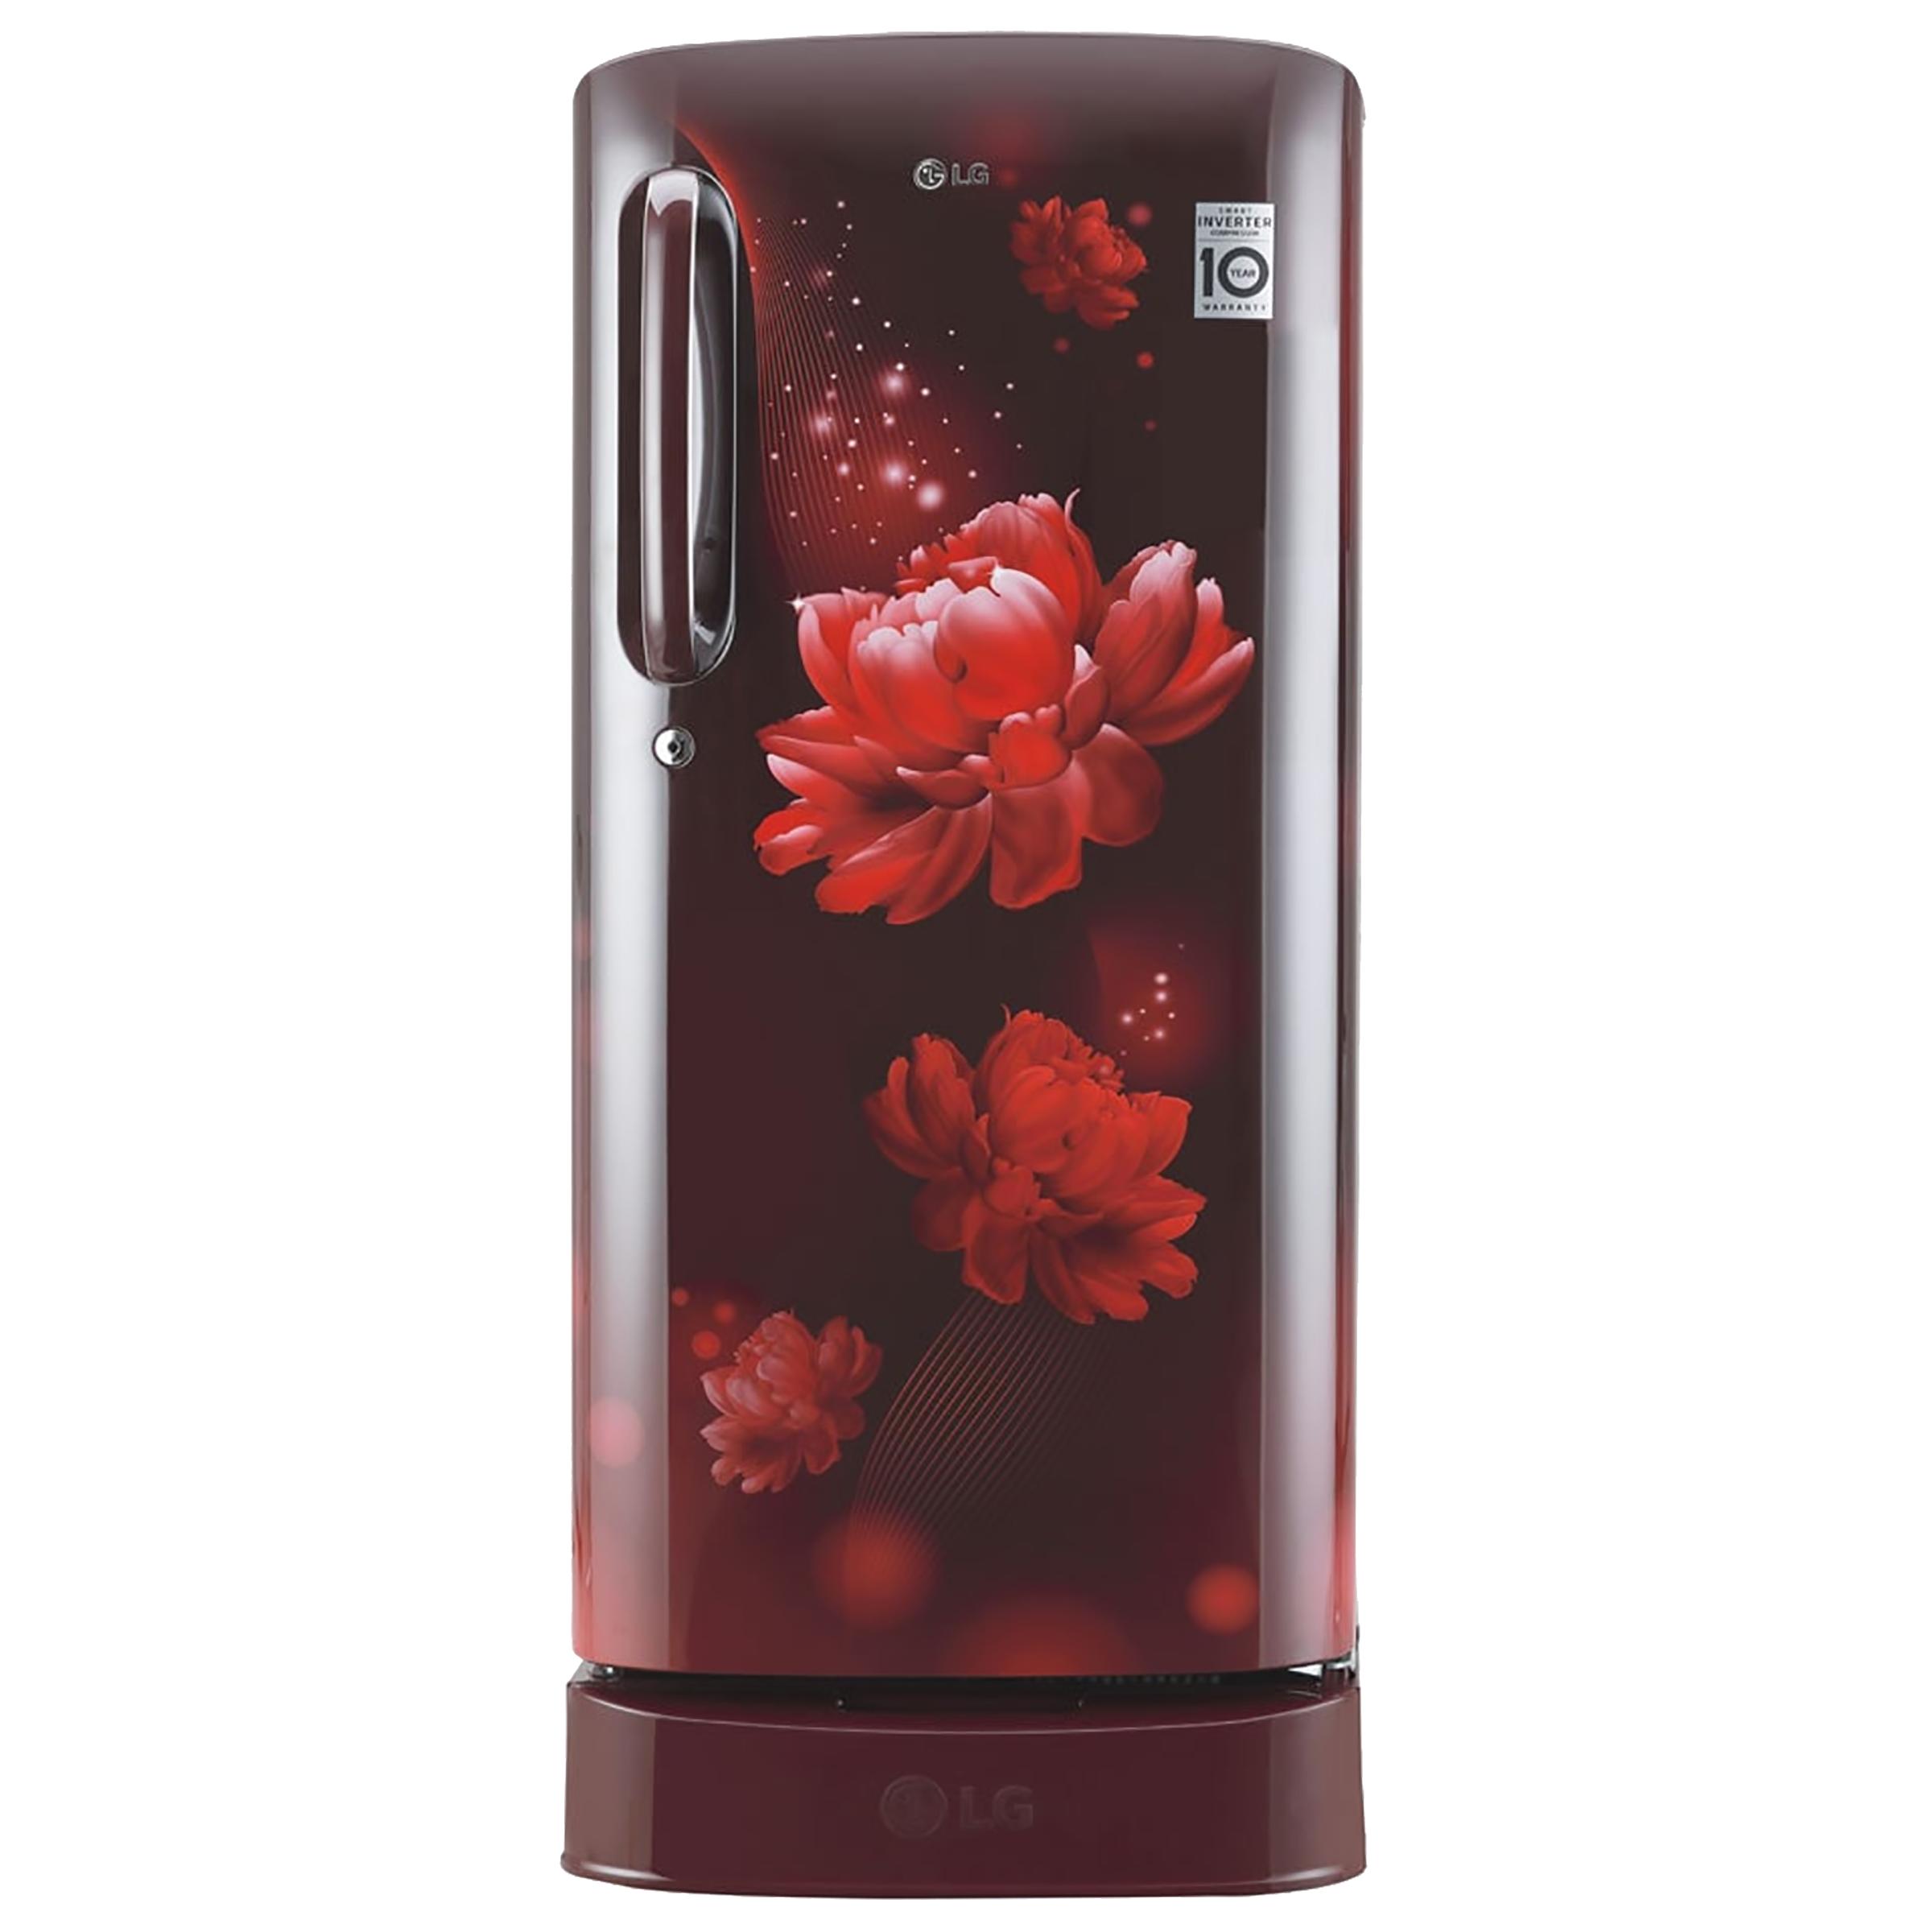 LG 190 Litres 4 Star Direct Cool Inverter Single Door Refrigerator (Smart Connect, GL-D201ASCY.ASCZEB, Scarlet Charm)_1